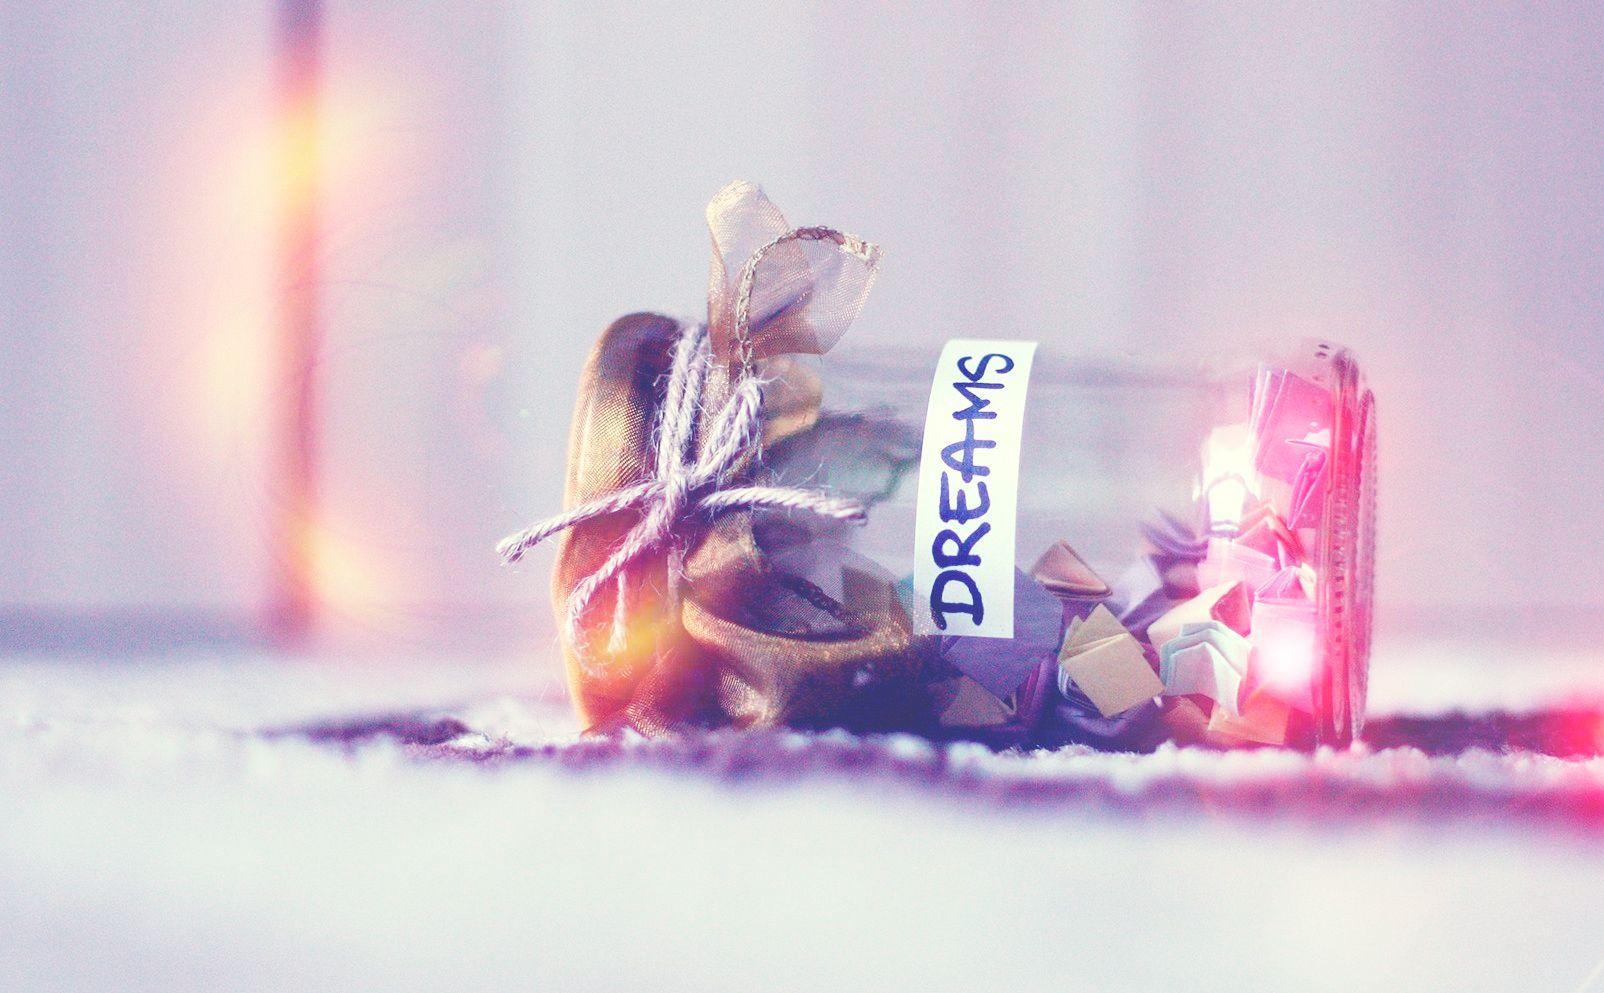 tumblr dream photography - Google keresés | Coors light beer can, Dream photography, Voss bottle